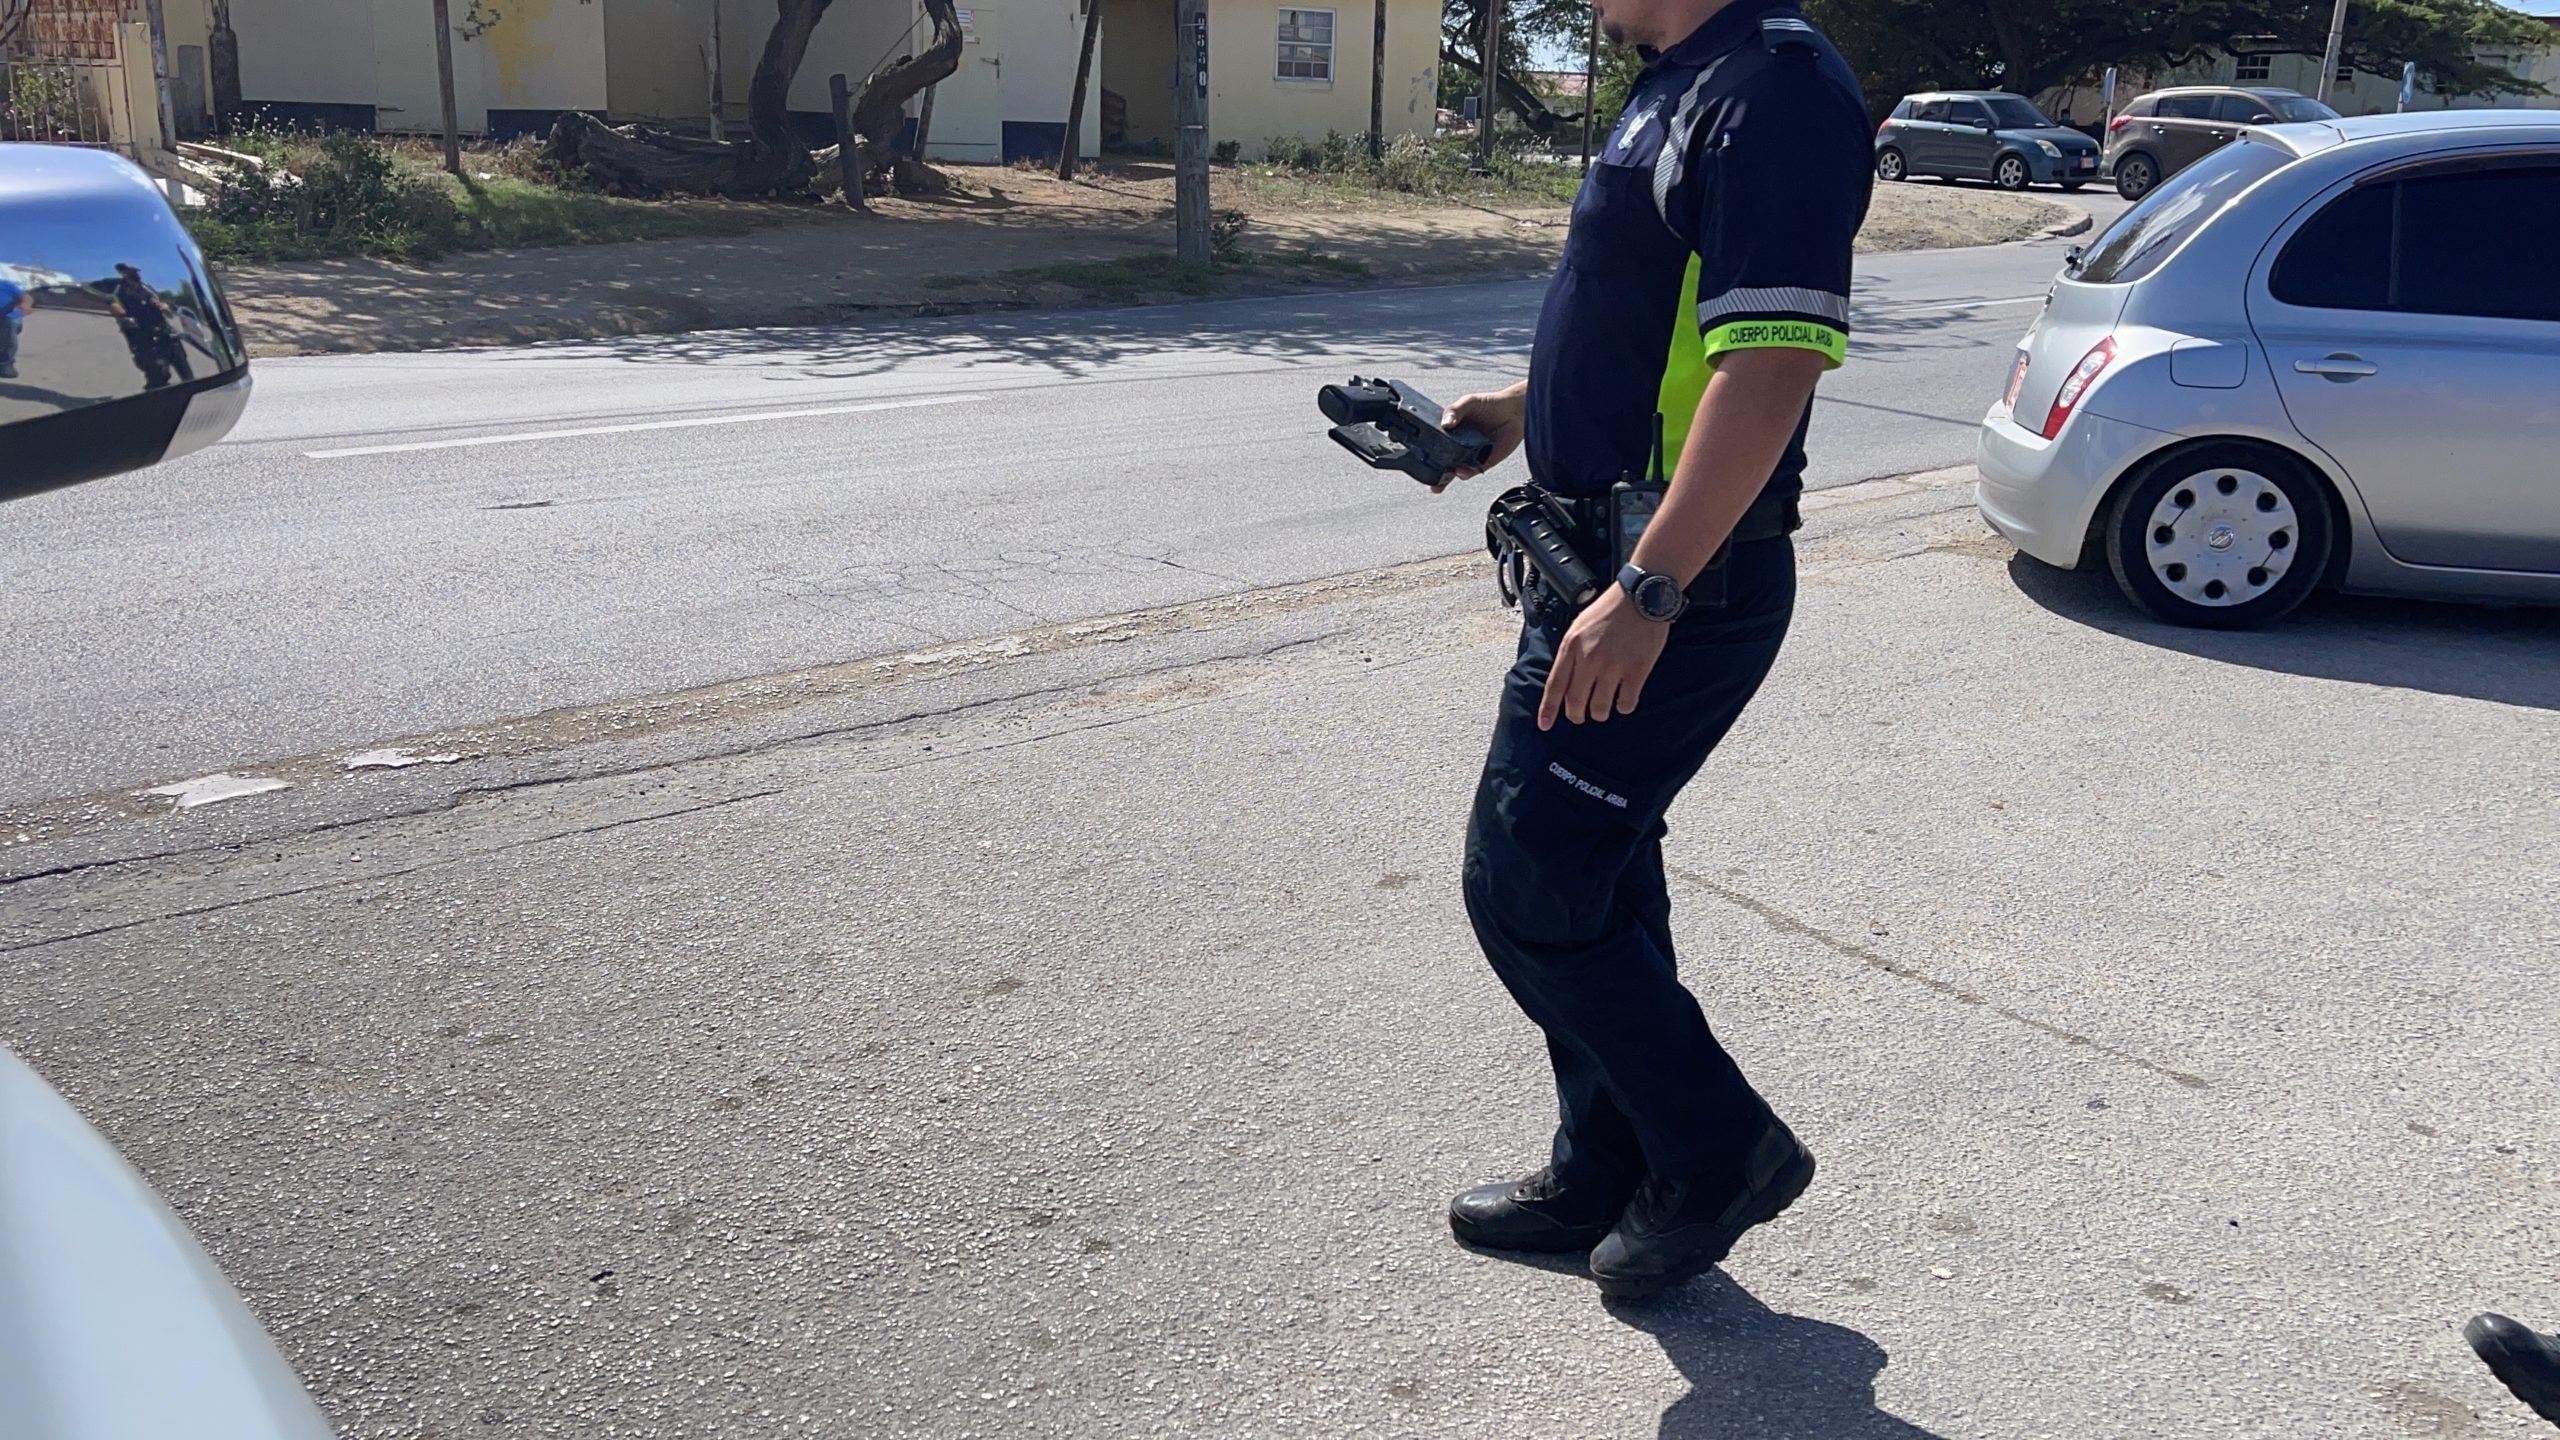 Menasa cu arma a bay robes den Santa Cruz